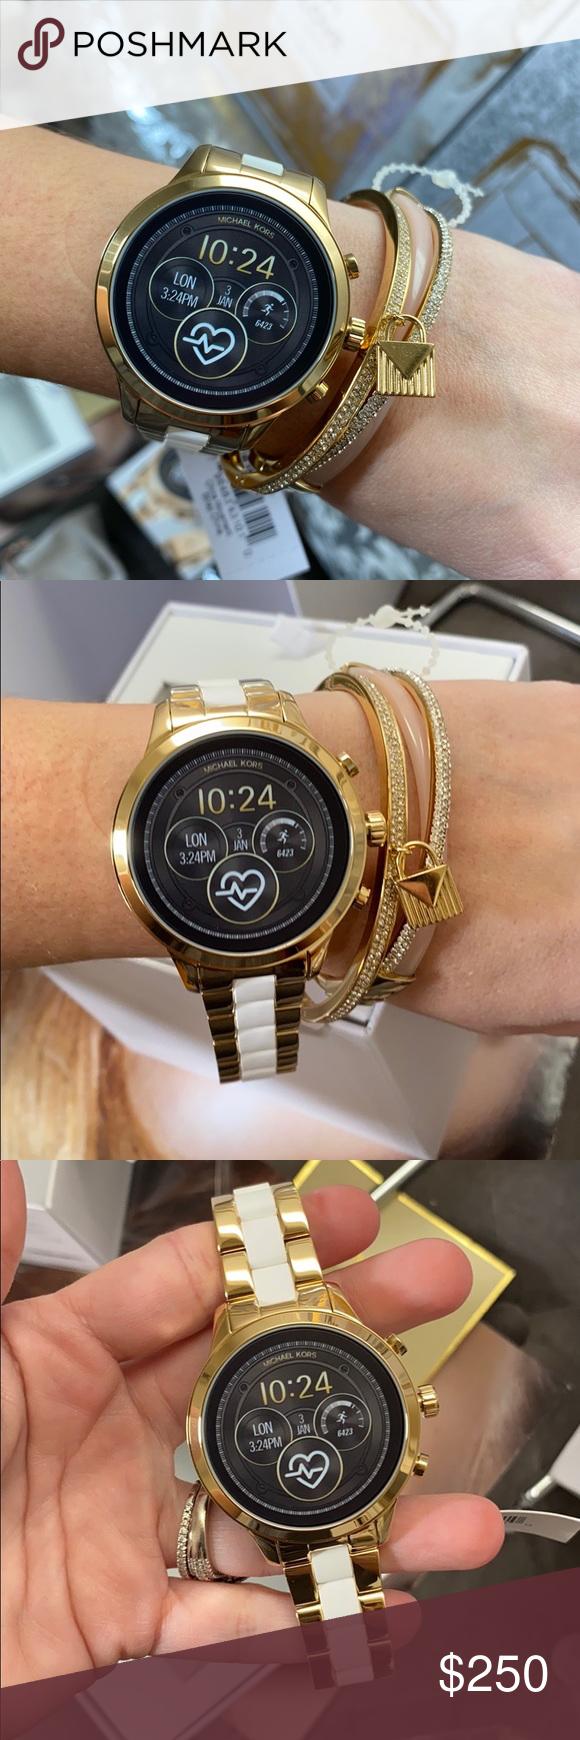 NWT Michael Kors access Sofie Smart watch Battery Life 1